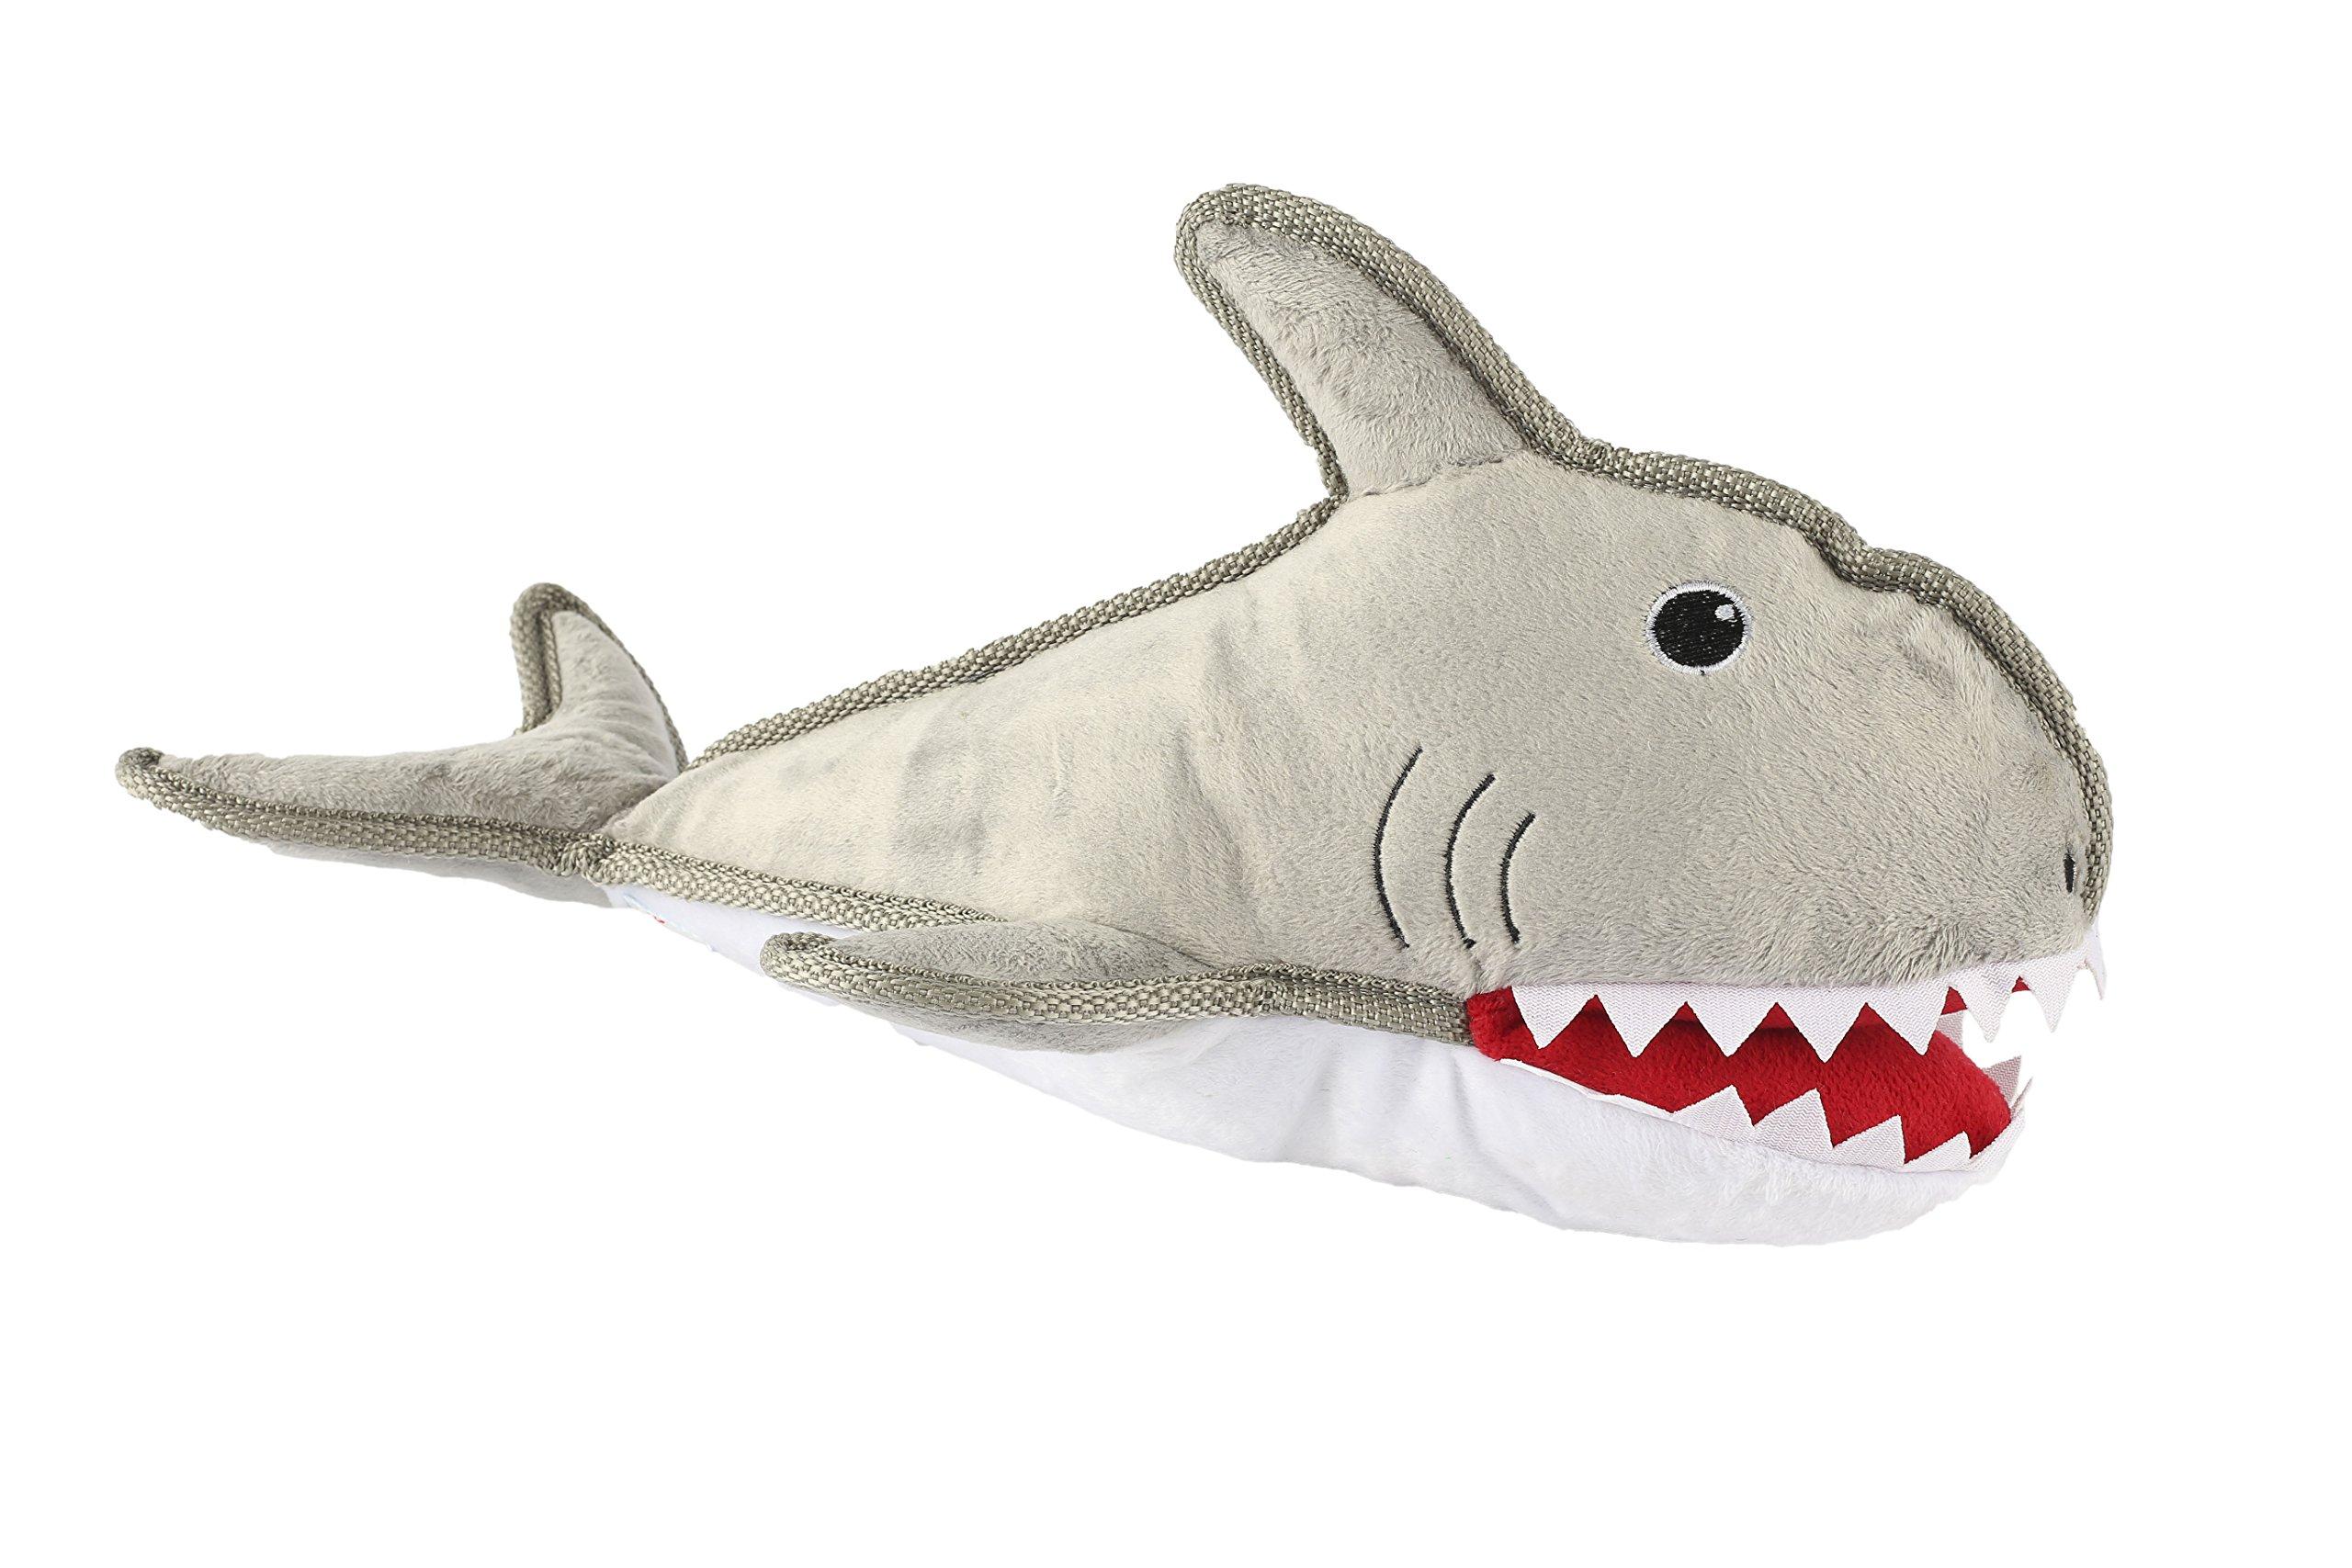 Mako the Shark - Near Indestructible Dog Toys - Squeaky Dog Toys Tough Dog T...